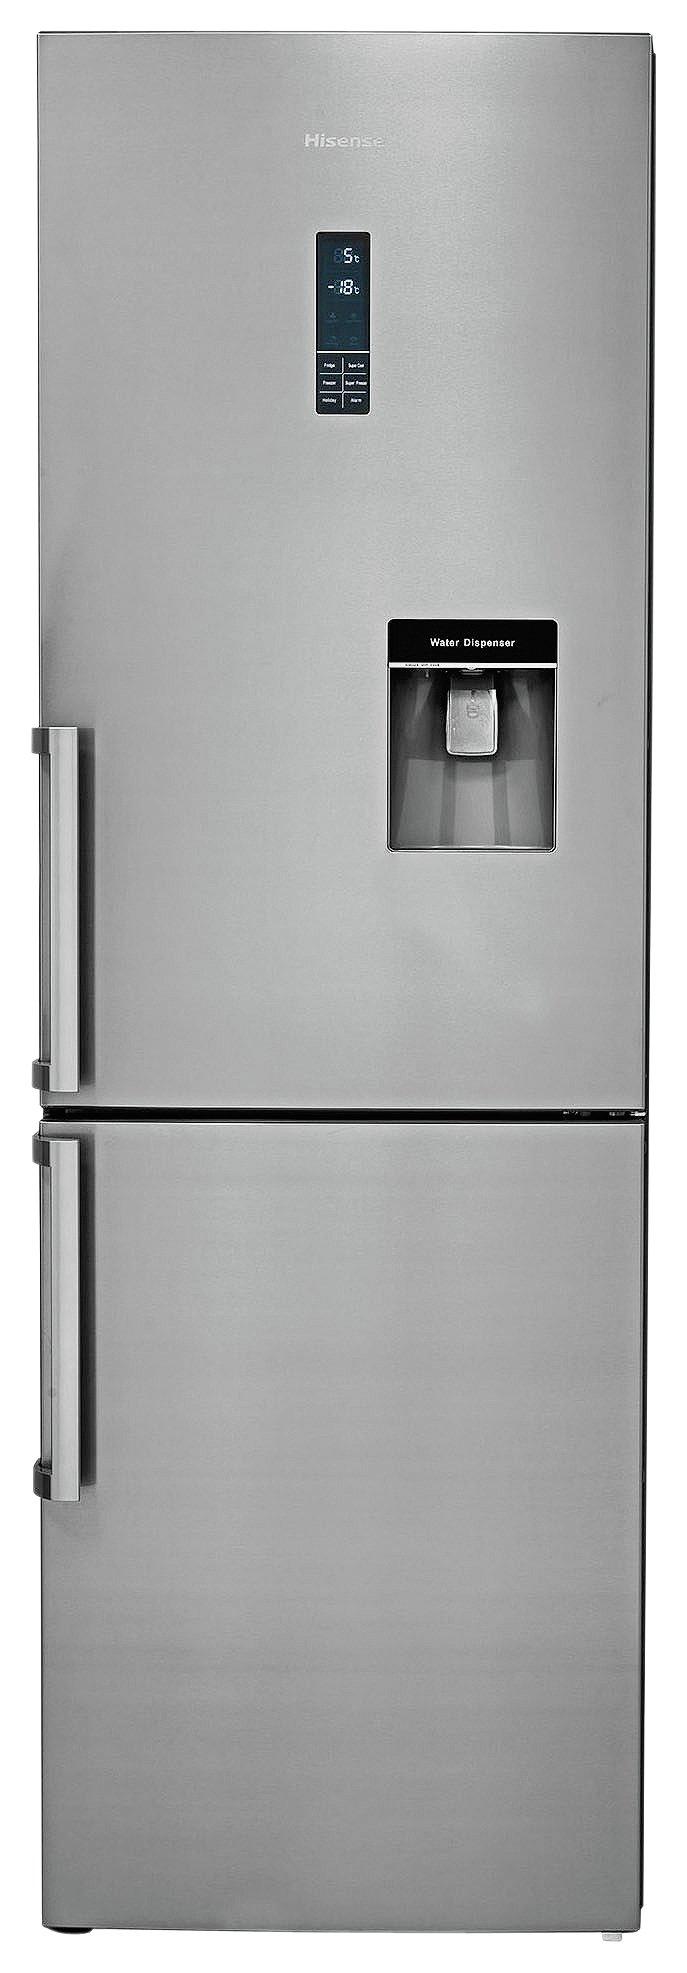 Hisense RB419N4WC1 Fridge Freezer with Water Dispenser.